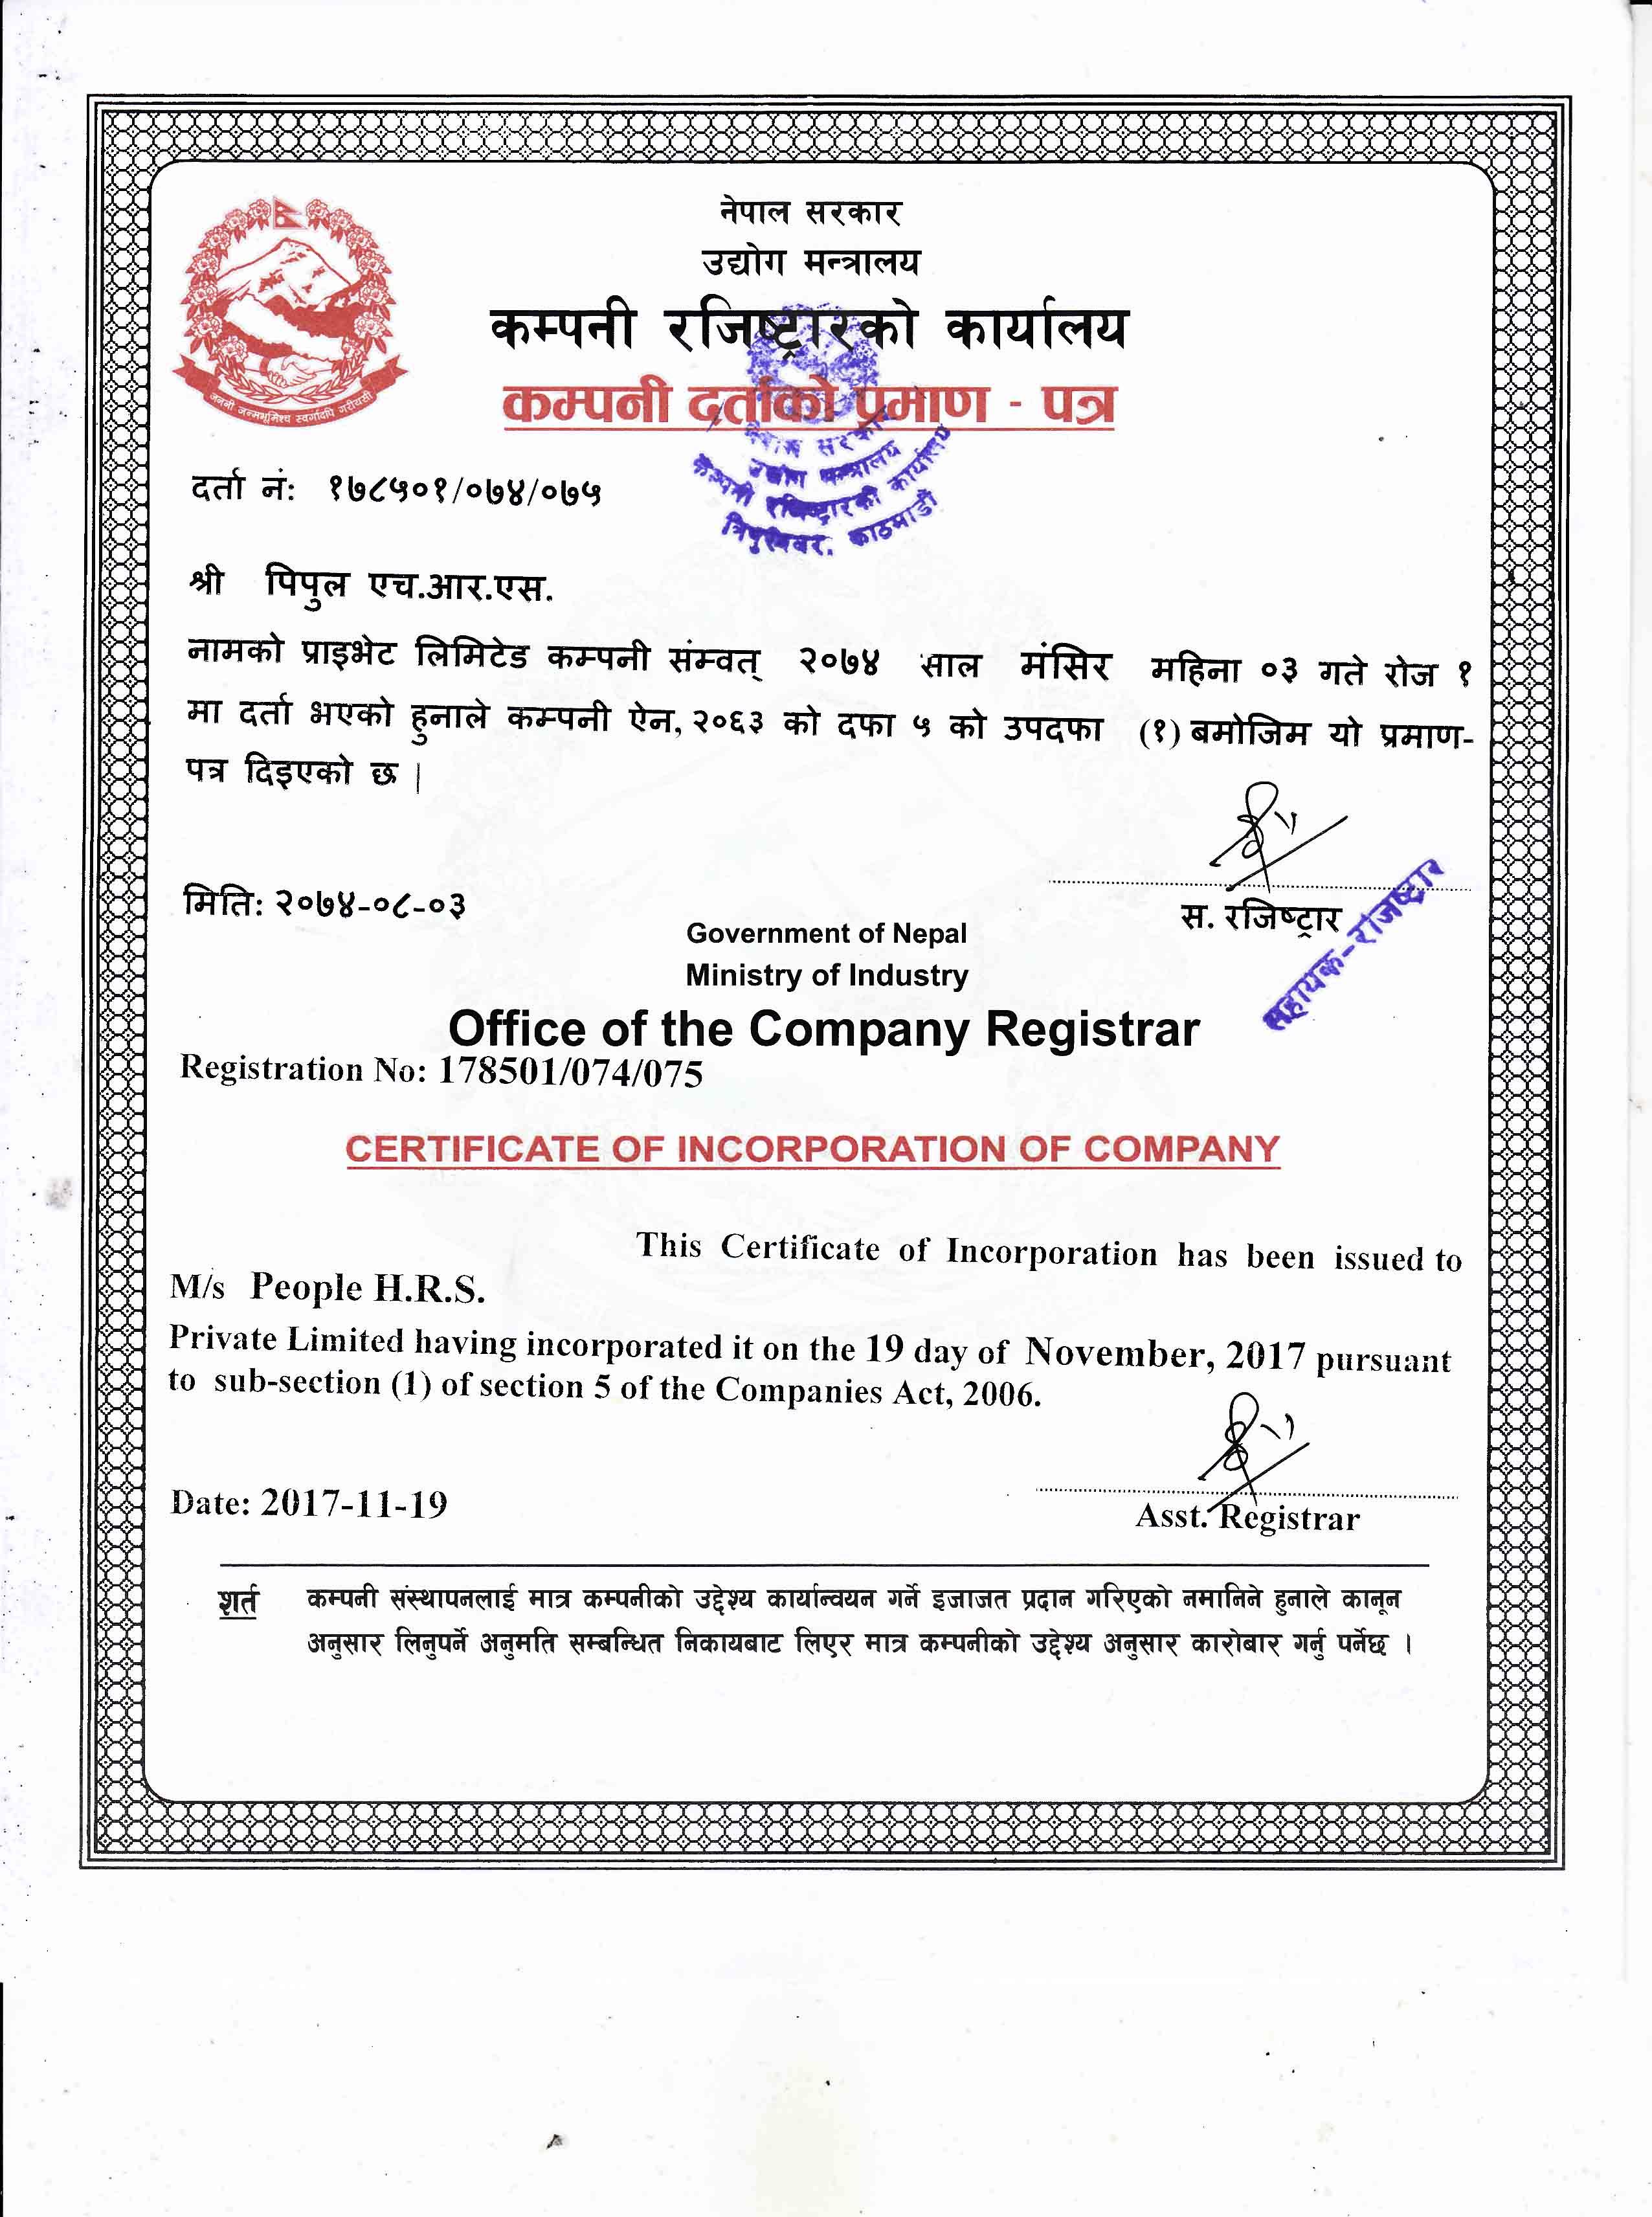 Company Registrar Certificate